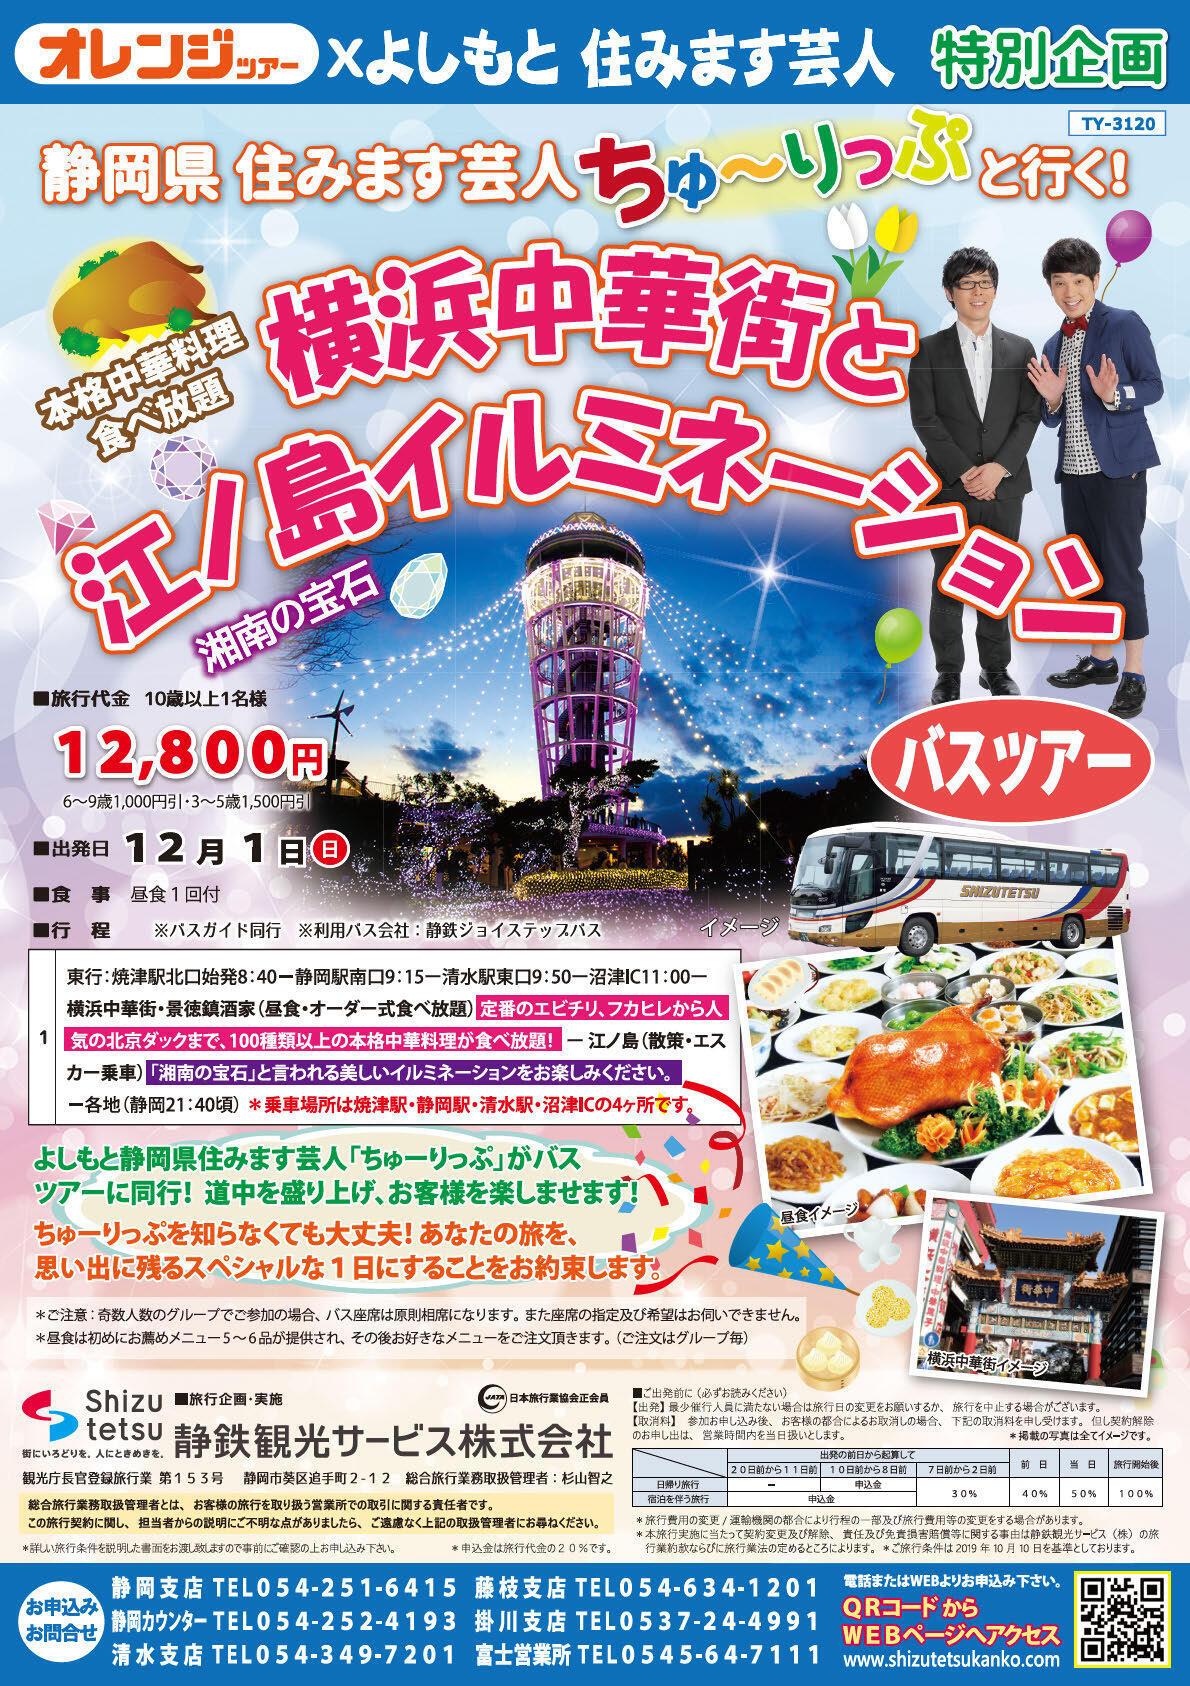 http://47web.jp/shizuoka/uploads/64088f5b33cbe5b044f5fa6f2dd50dc5f5874ba4.jpg